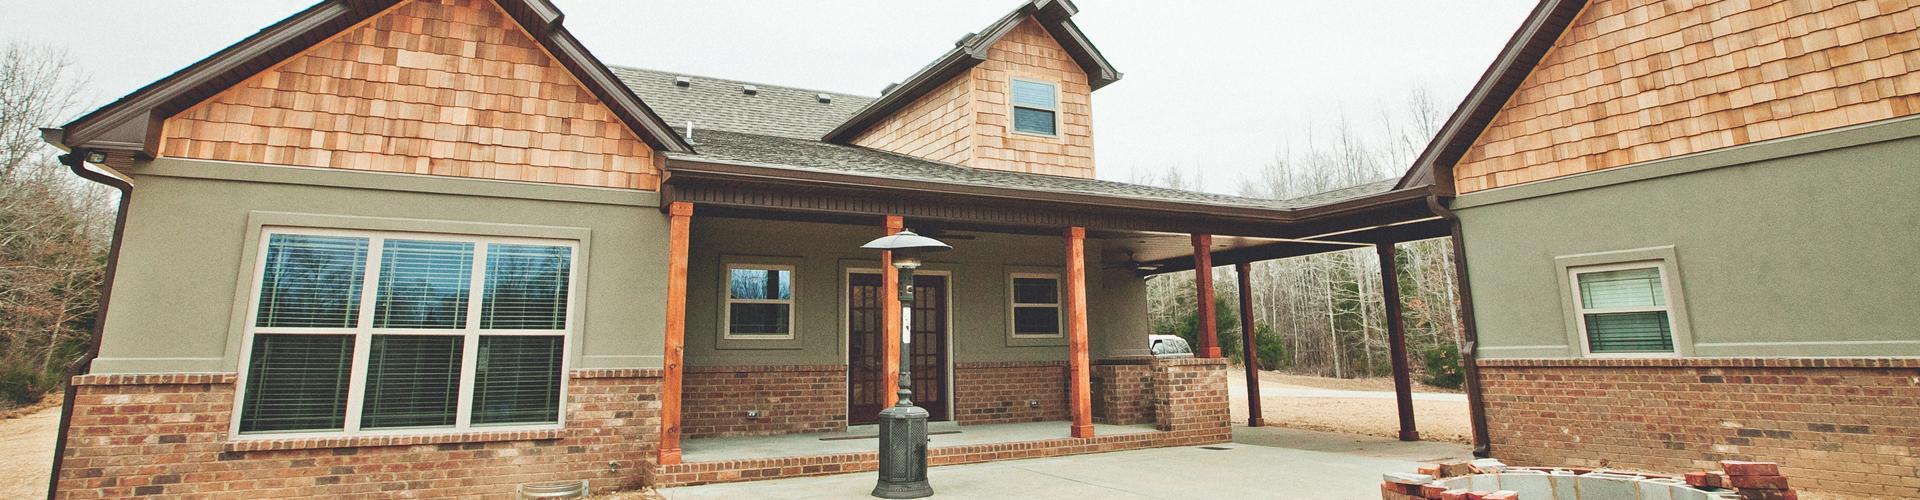 Jake Welch Construction - Custom Home Builder & Remodeler – Clarksville, TN